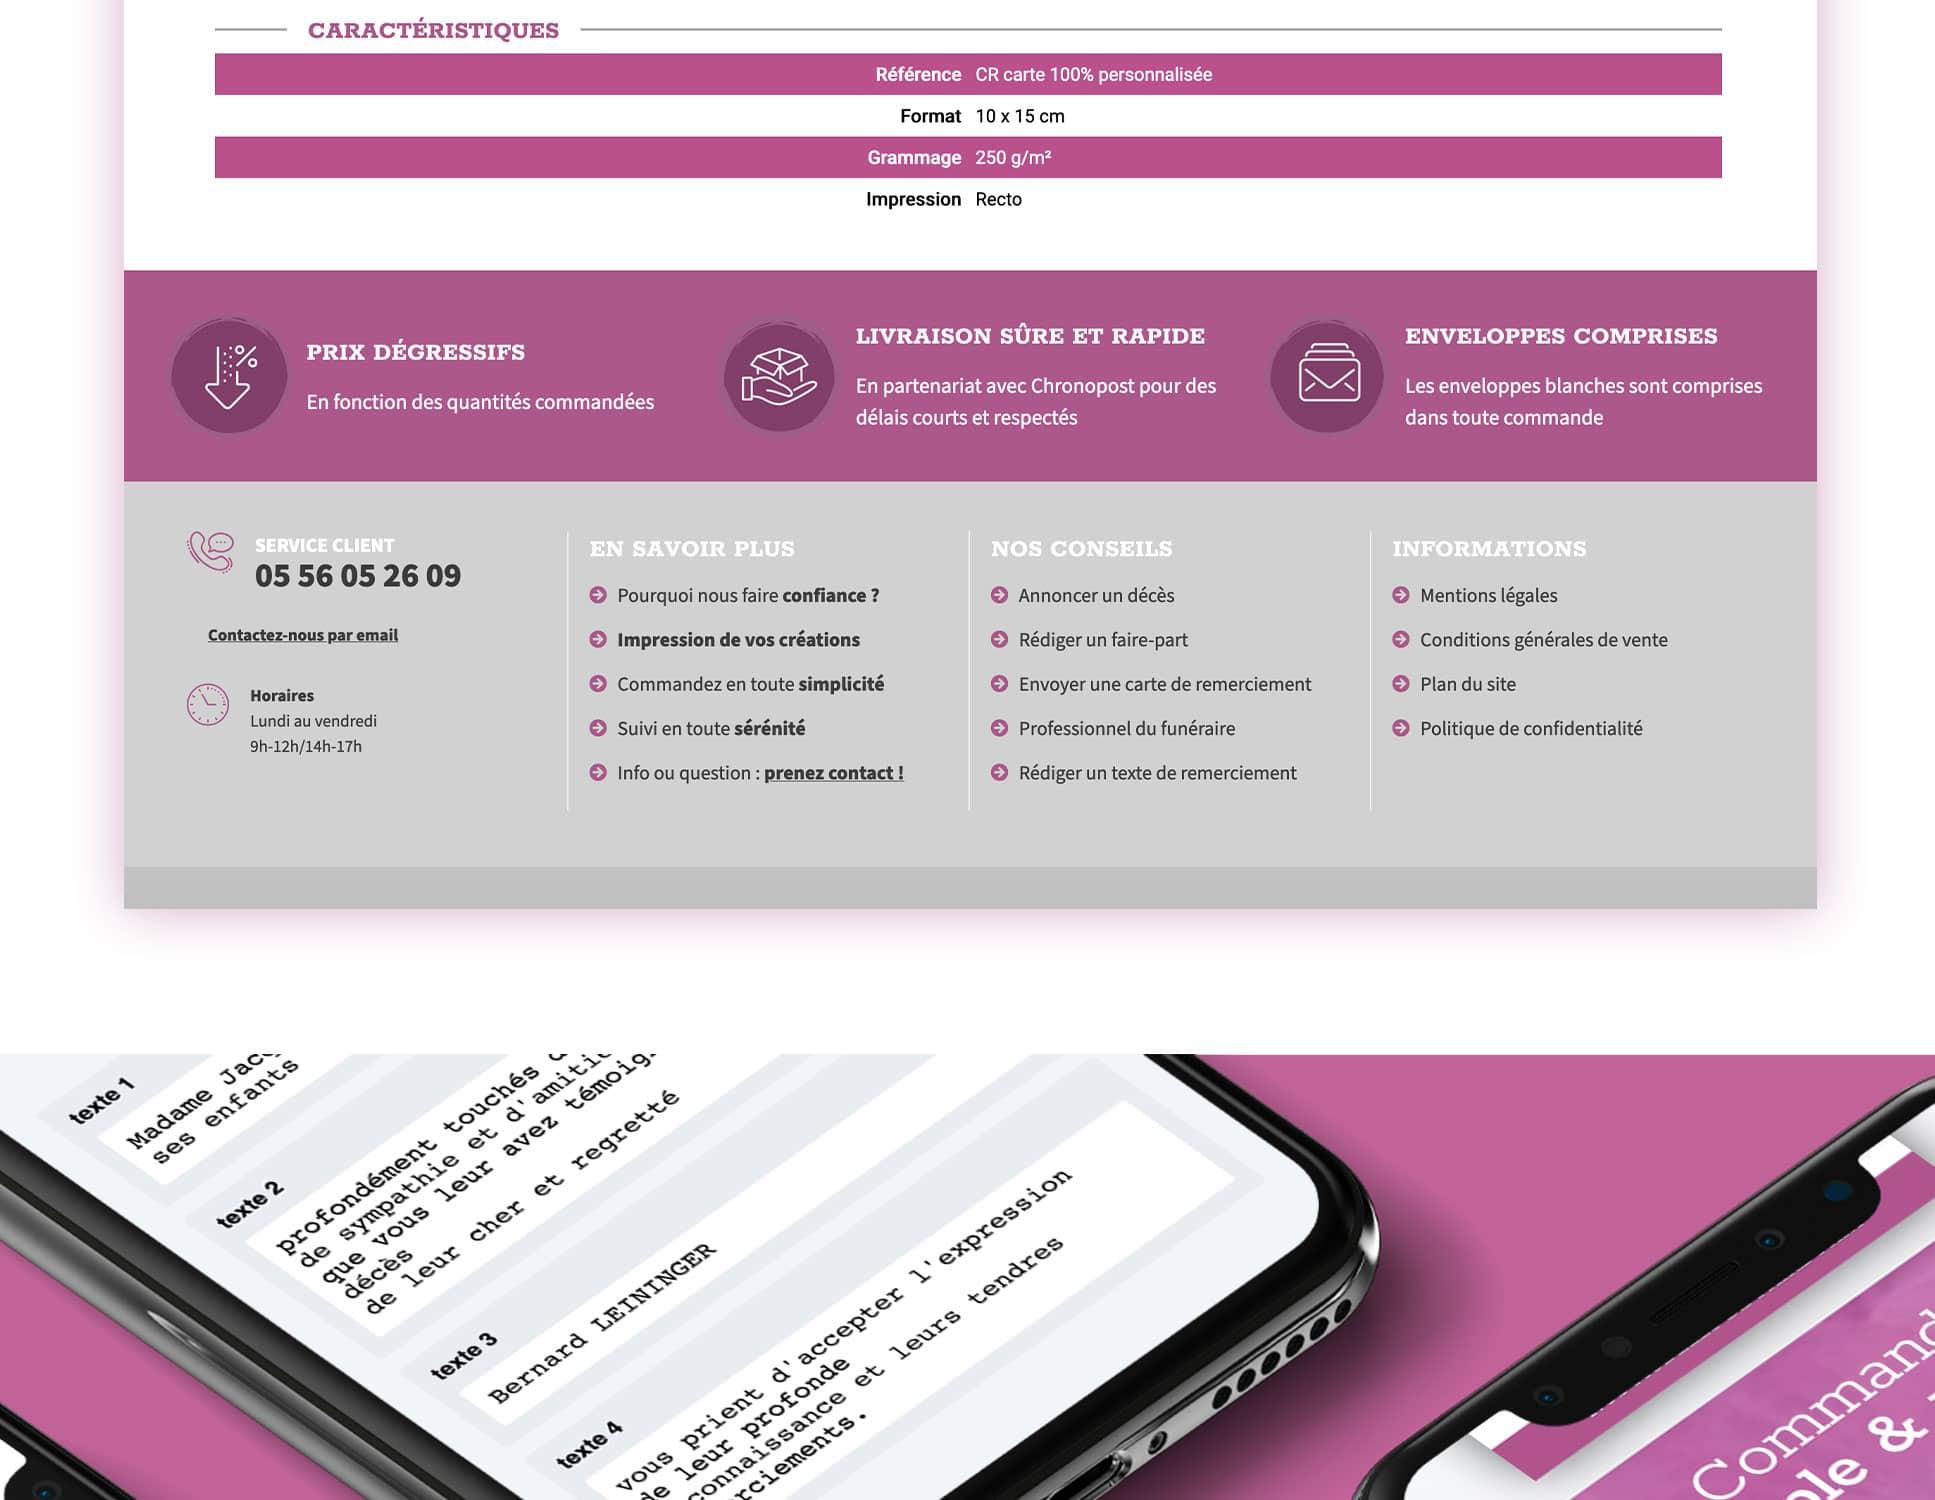 Deuil Imprim refonte Prestashop par Webperfect